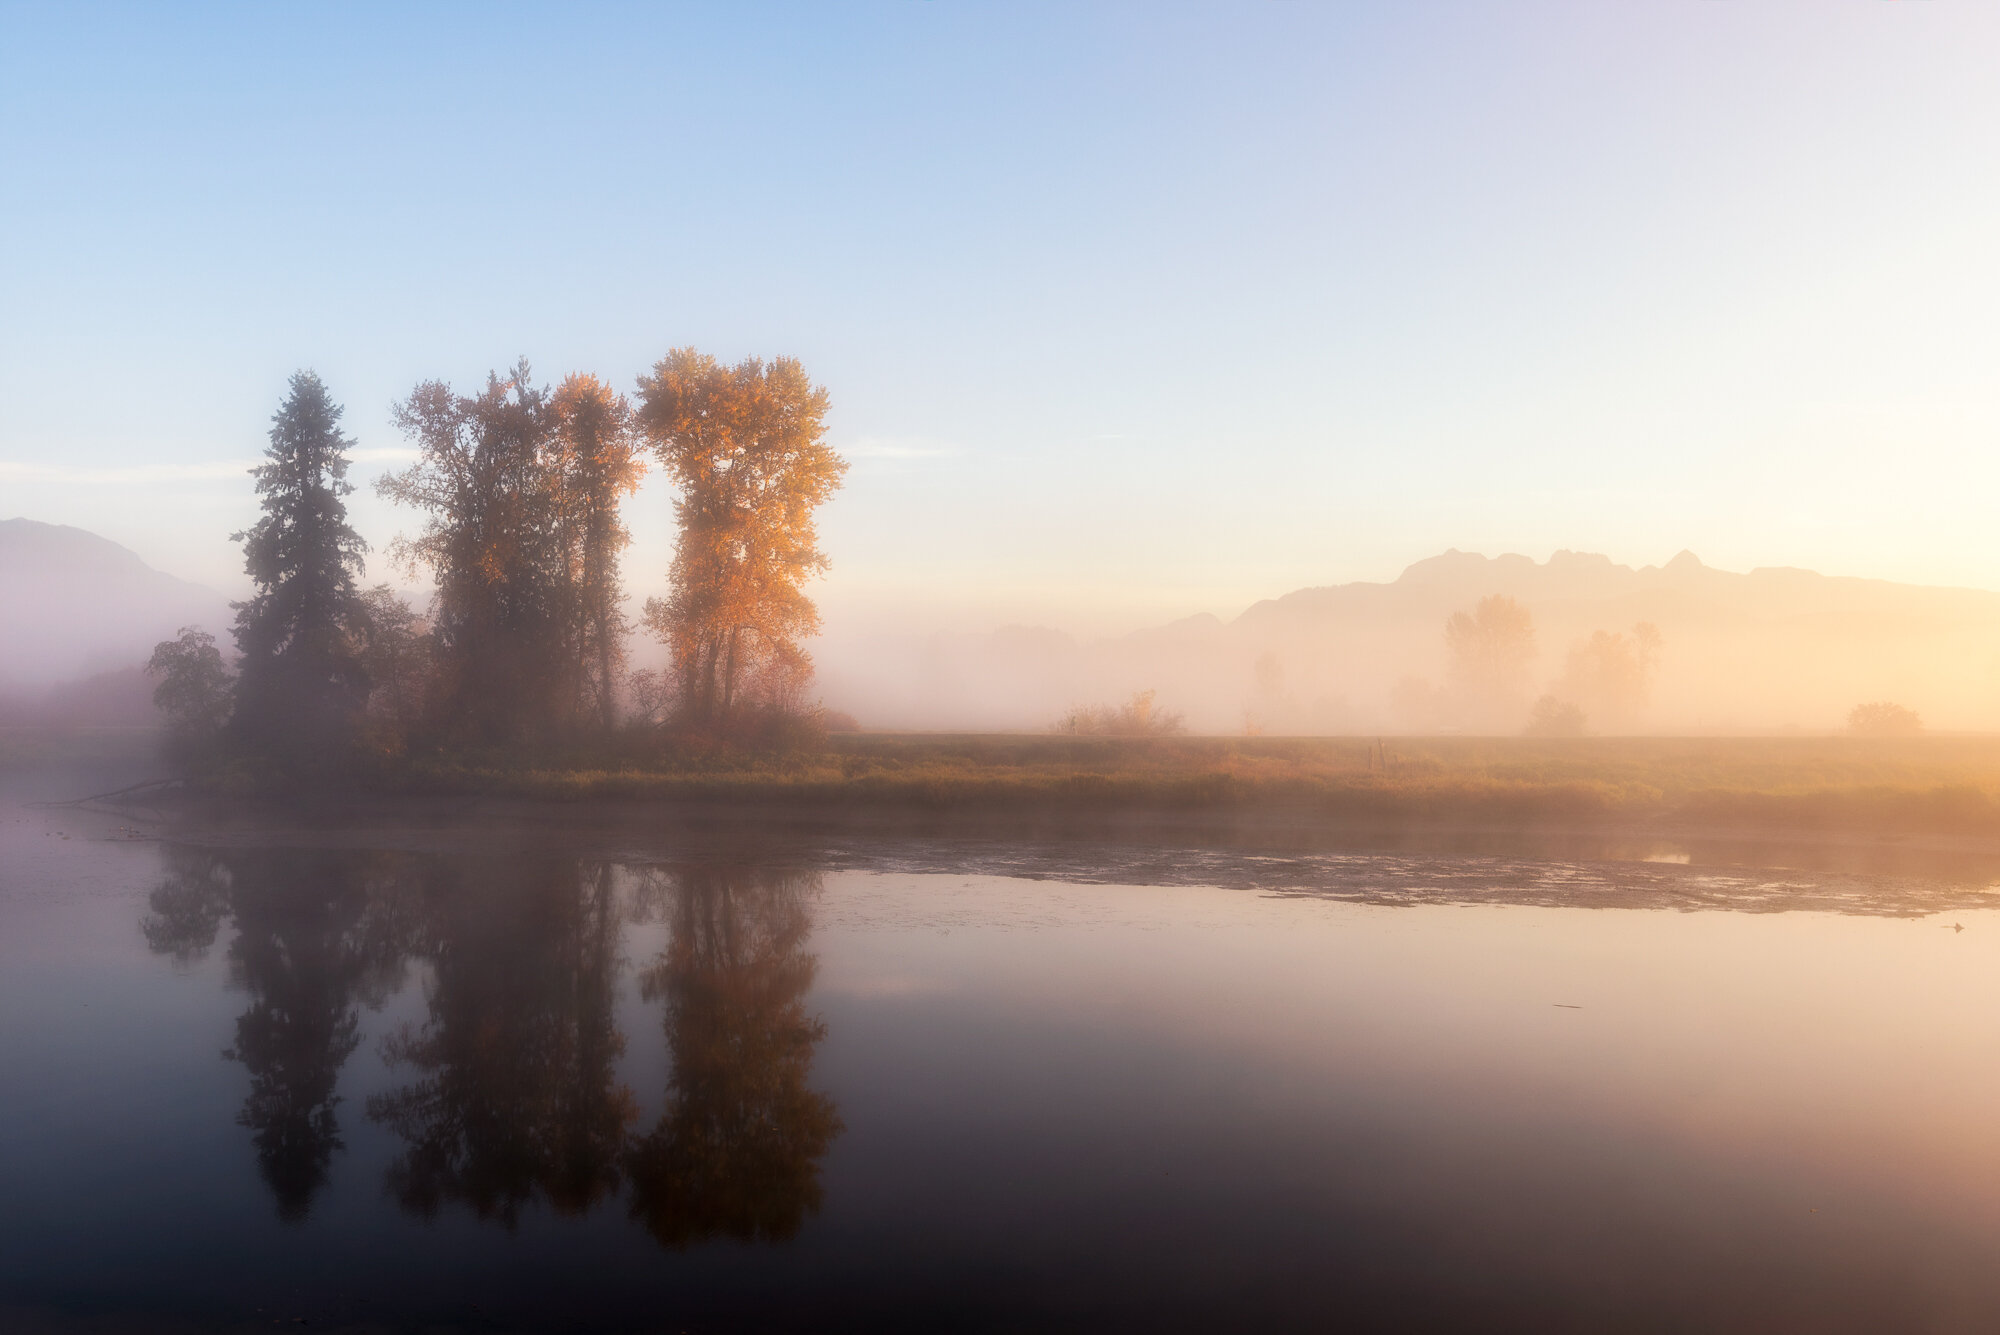 'Misty Morning'